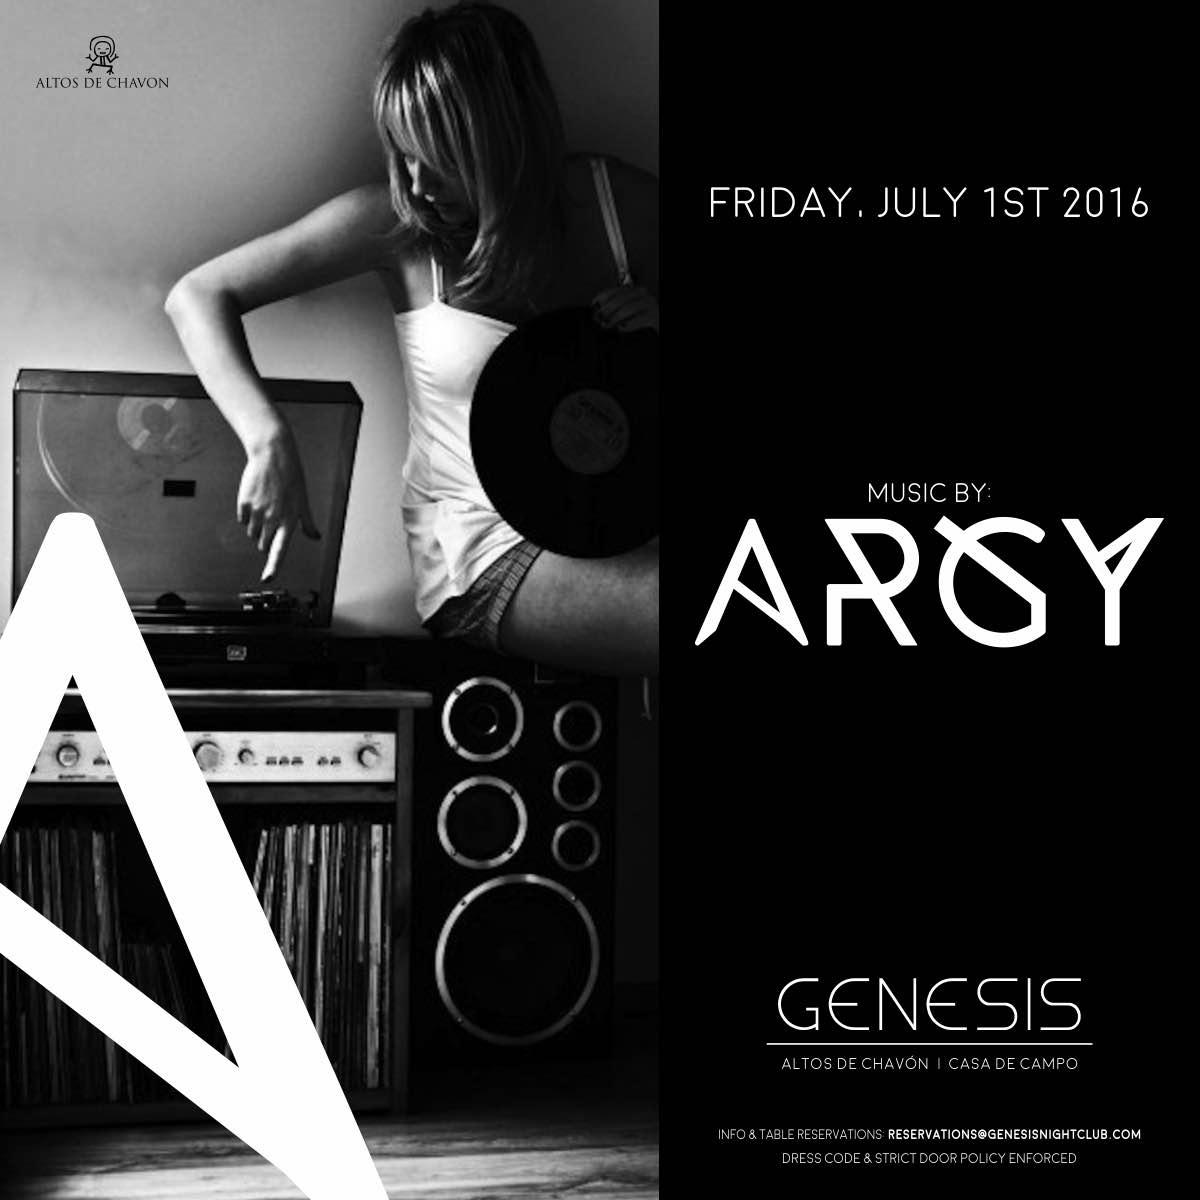 DJ Argy Genesis Night Club July 1 2016